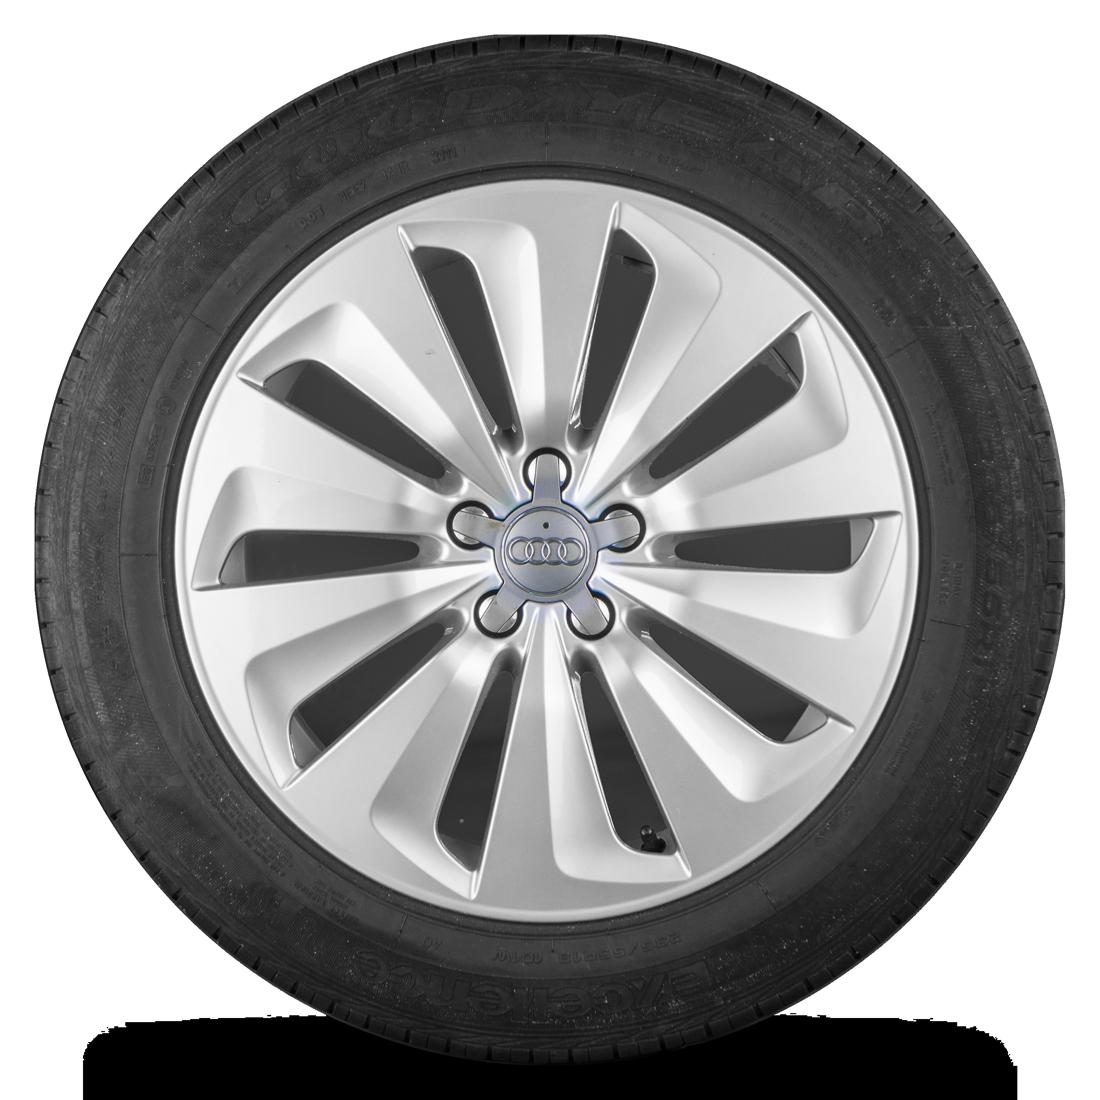 Audi Q5 SQ5 8R 19 Zoll Alufelgen Felgen Sommerreifen Sommerräder S line Turbine